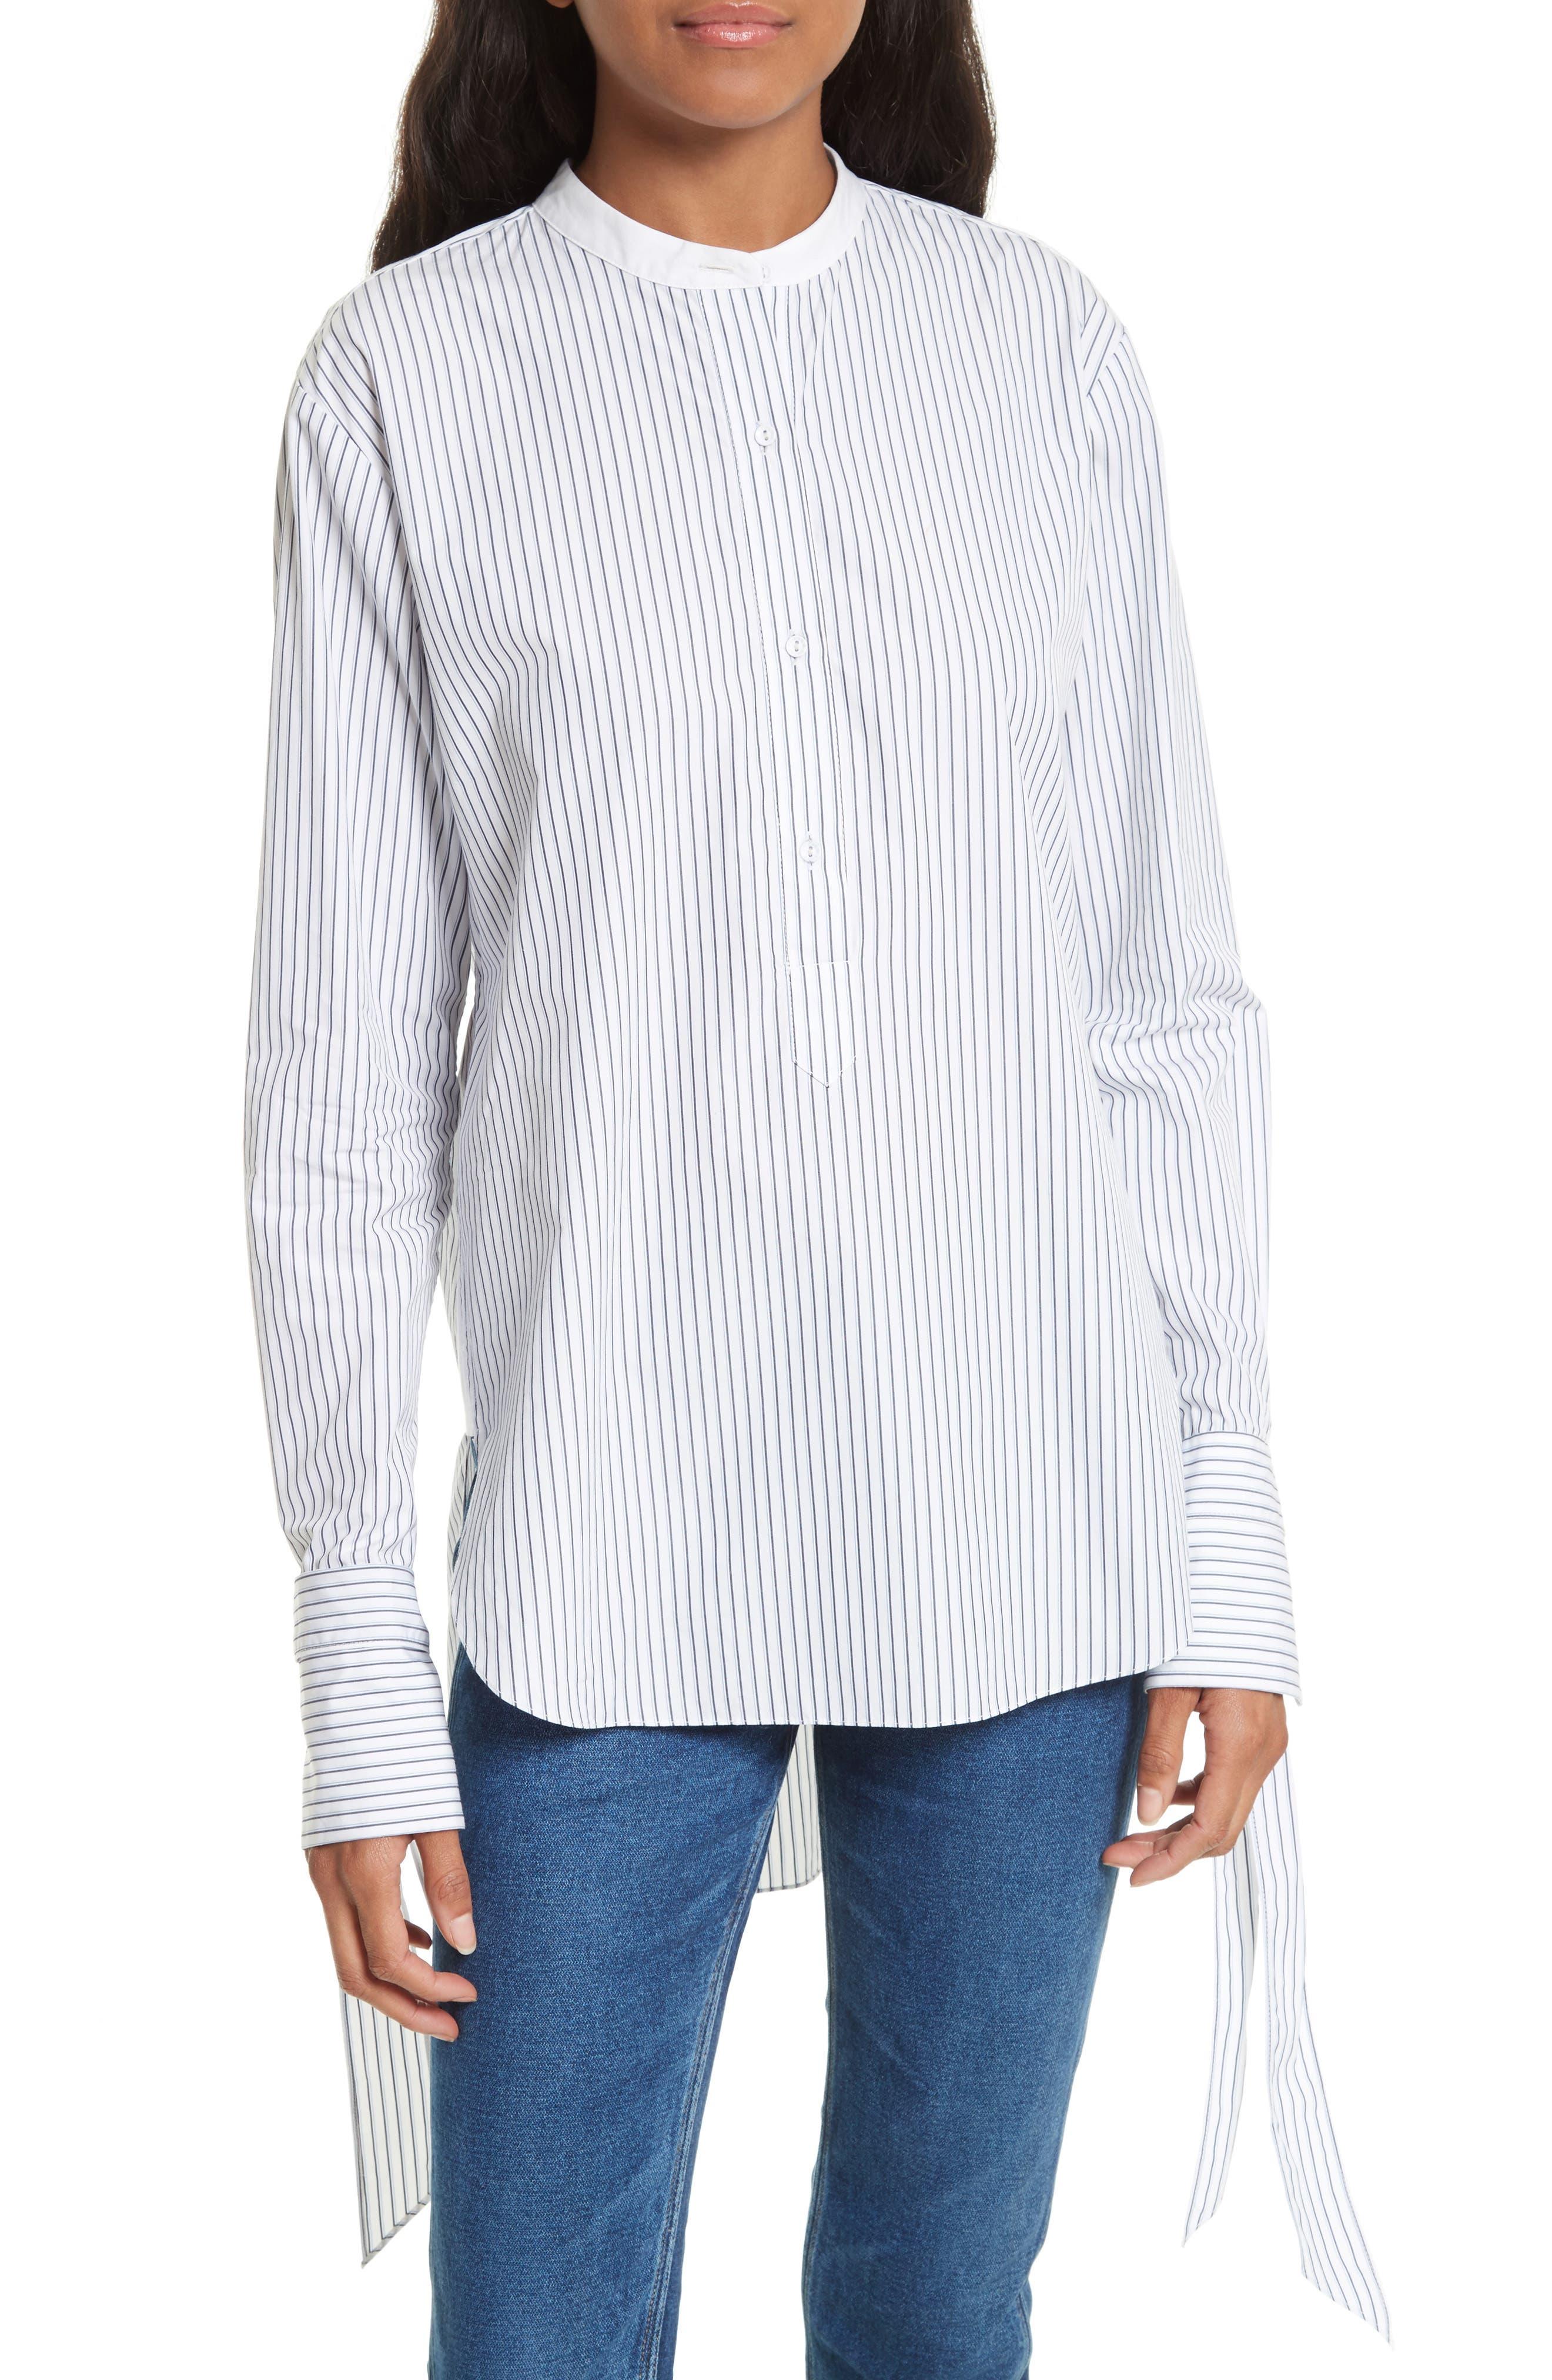 Dylan Shirt,                         Main,                         color, 400